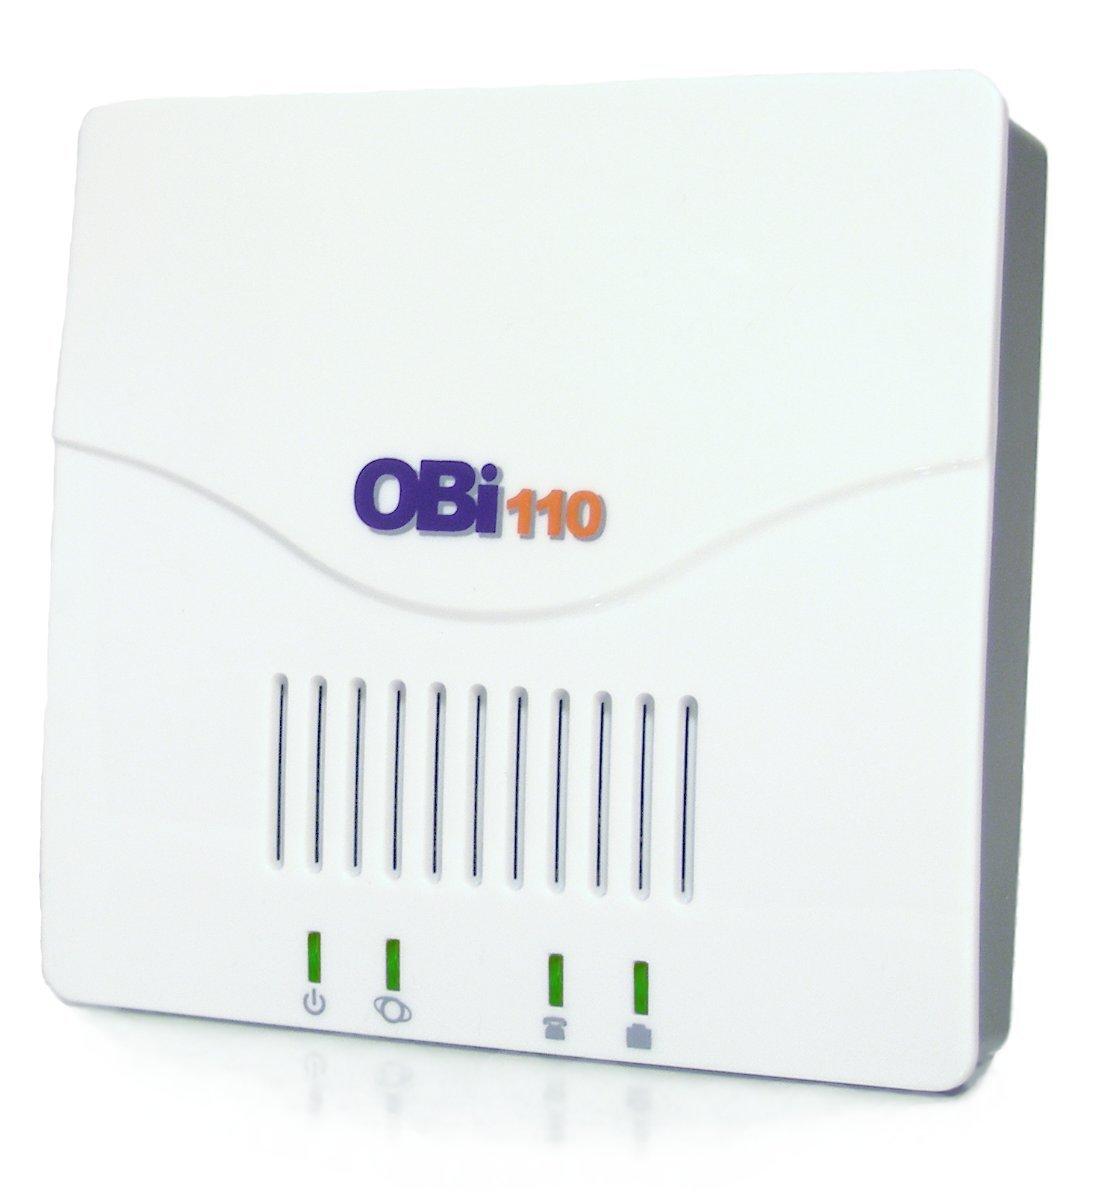 Obihai OBi110 Voice Service Bridge and VoIP Telephone Adapter